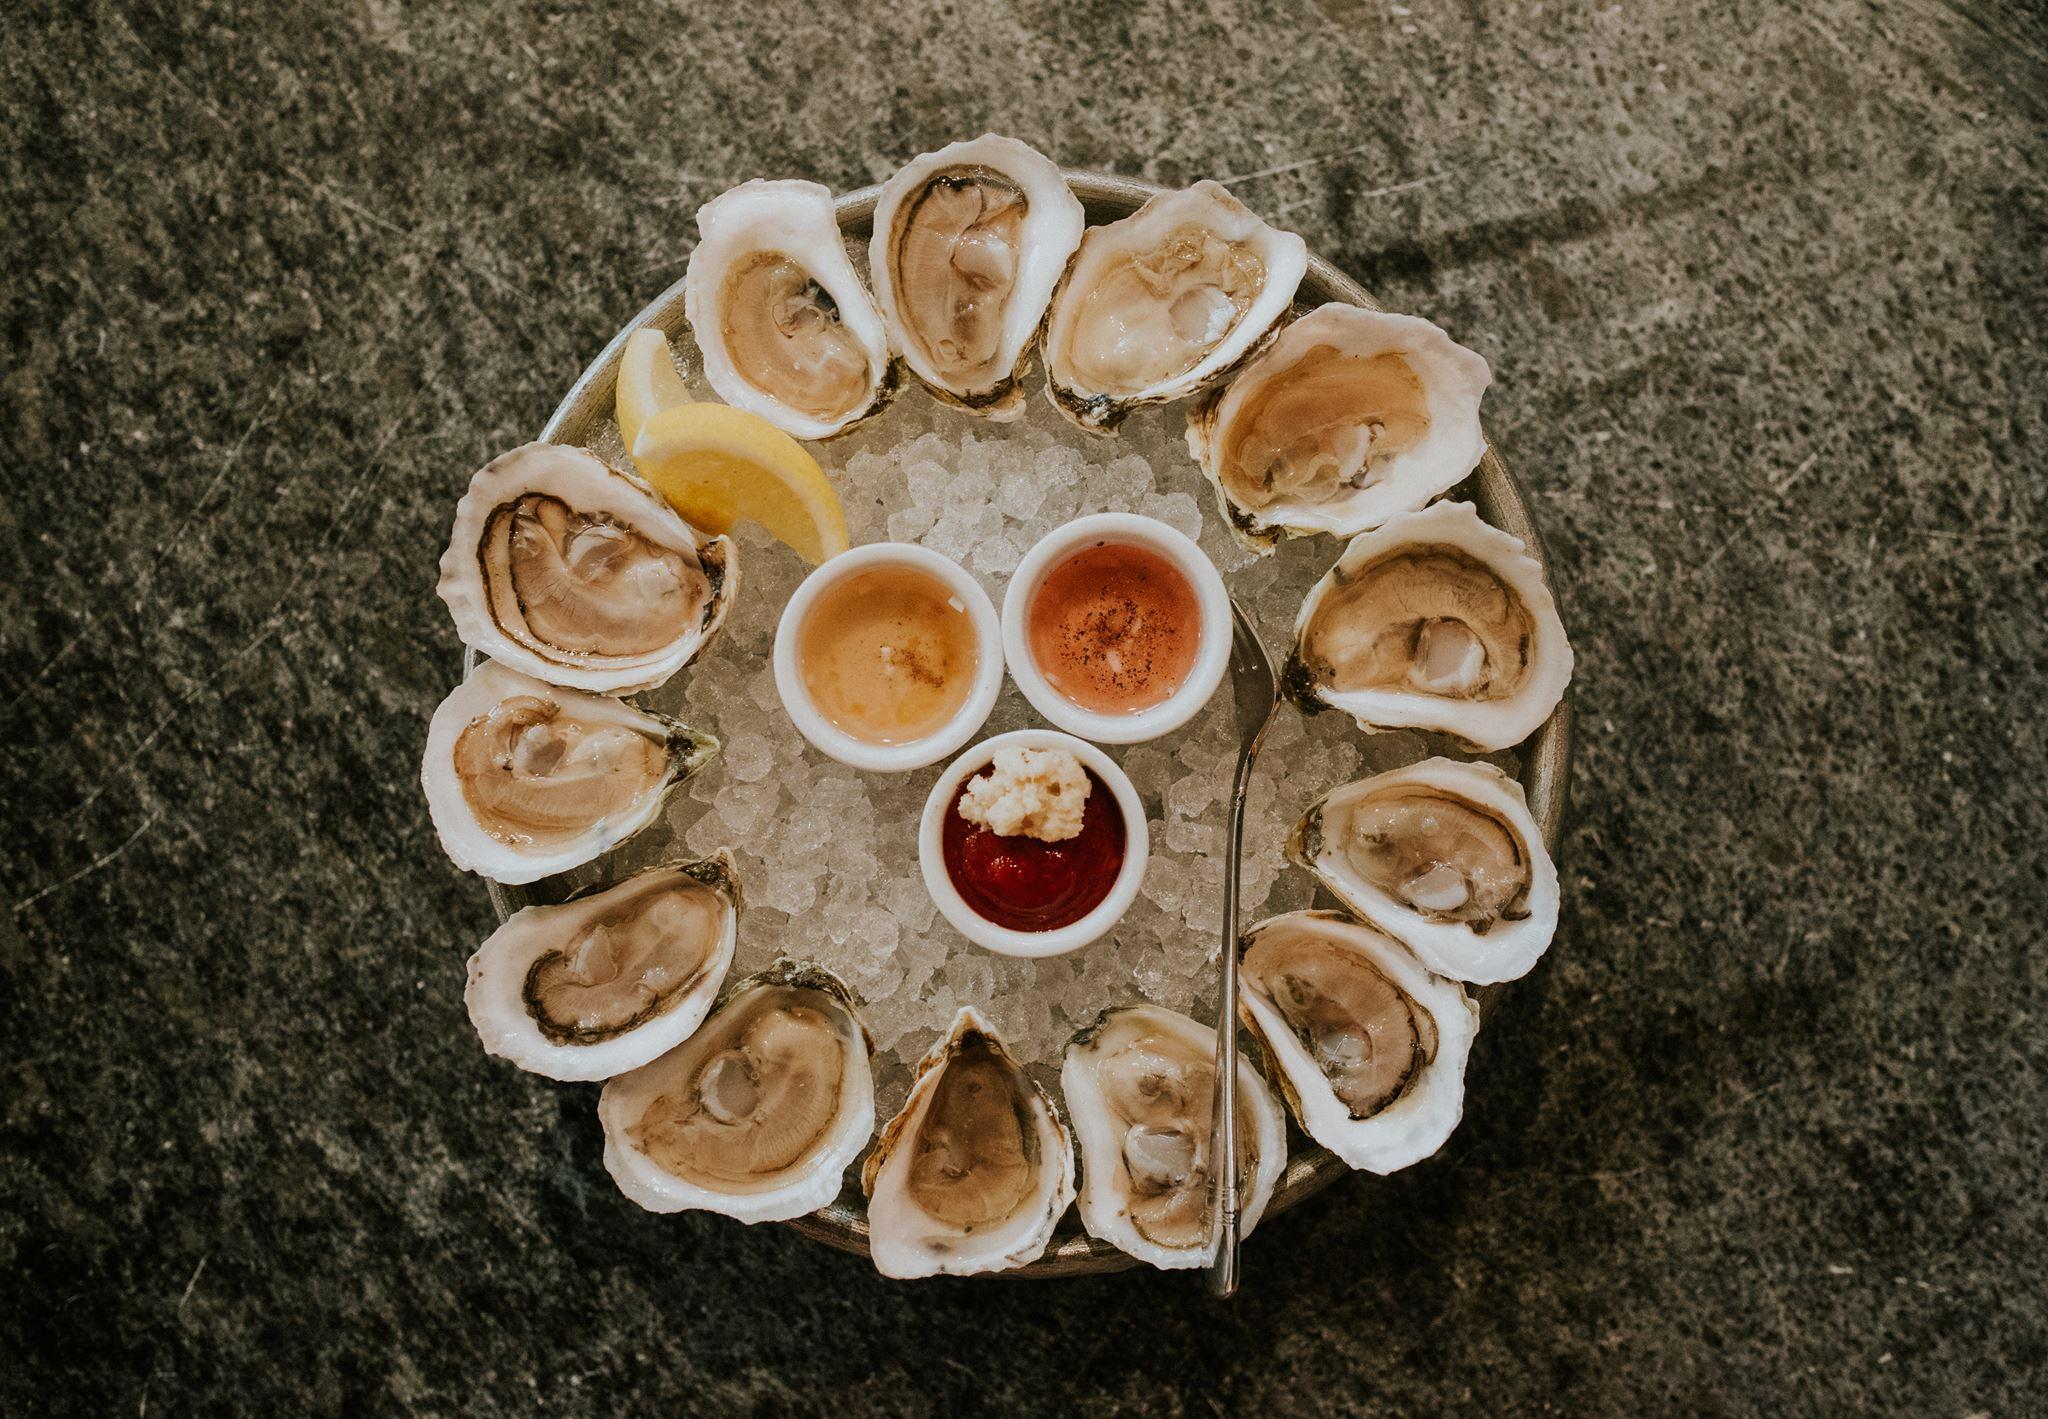 The Oyster Bar at Les Sablons